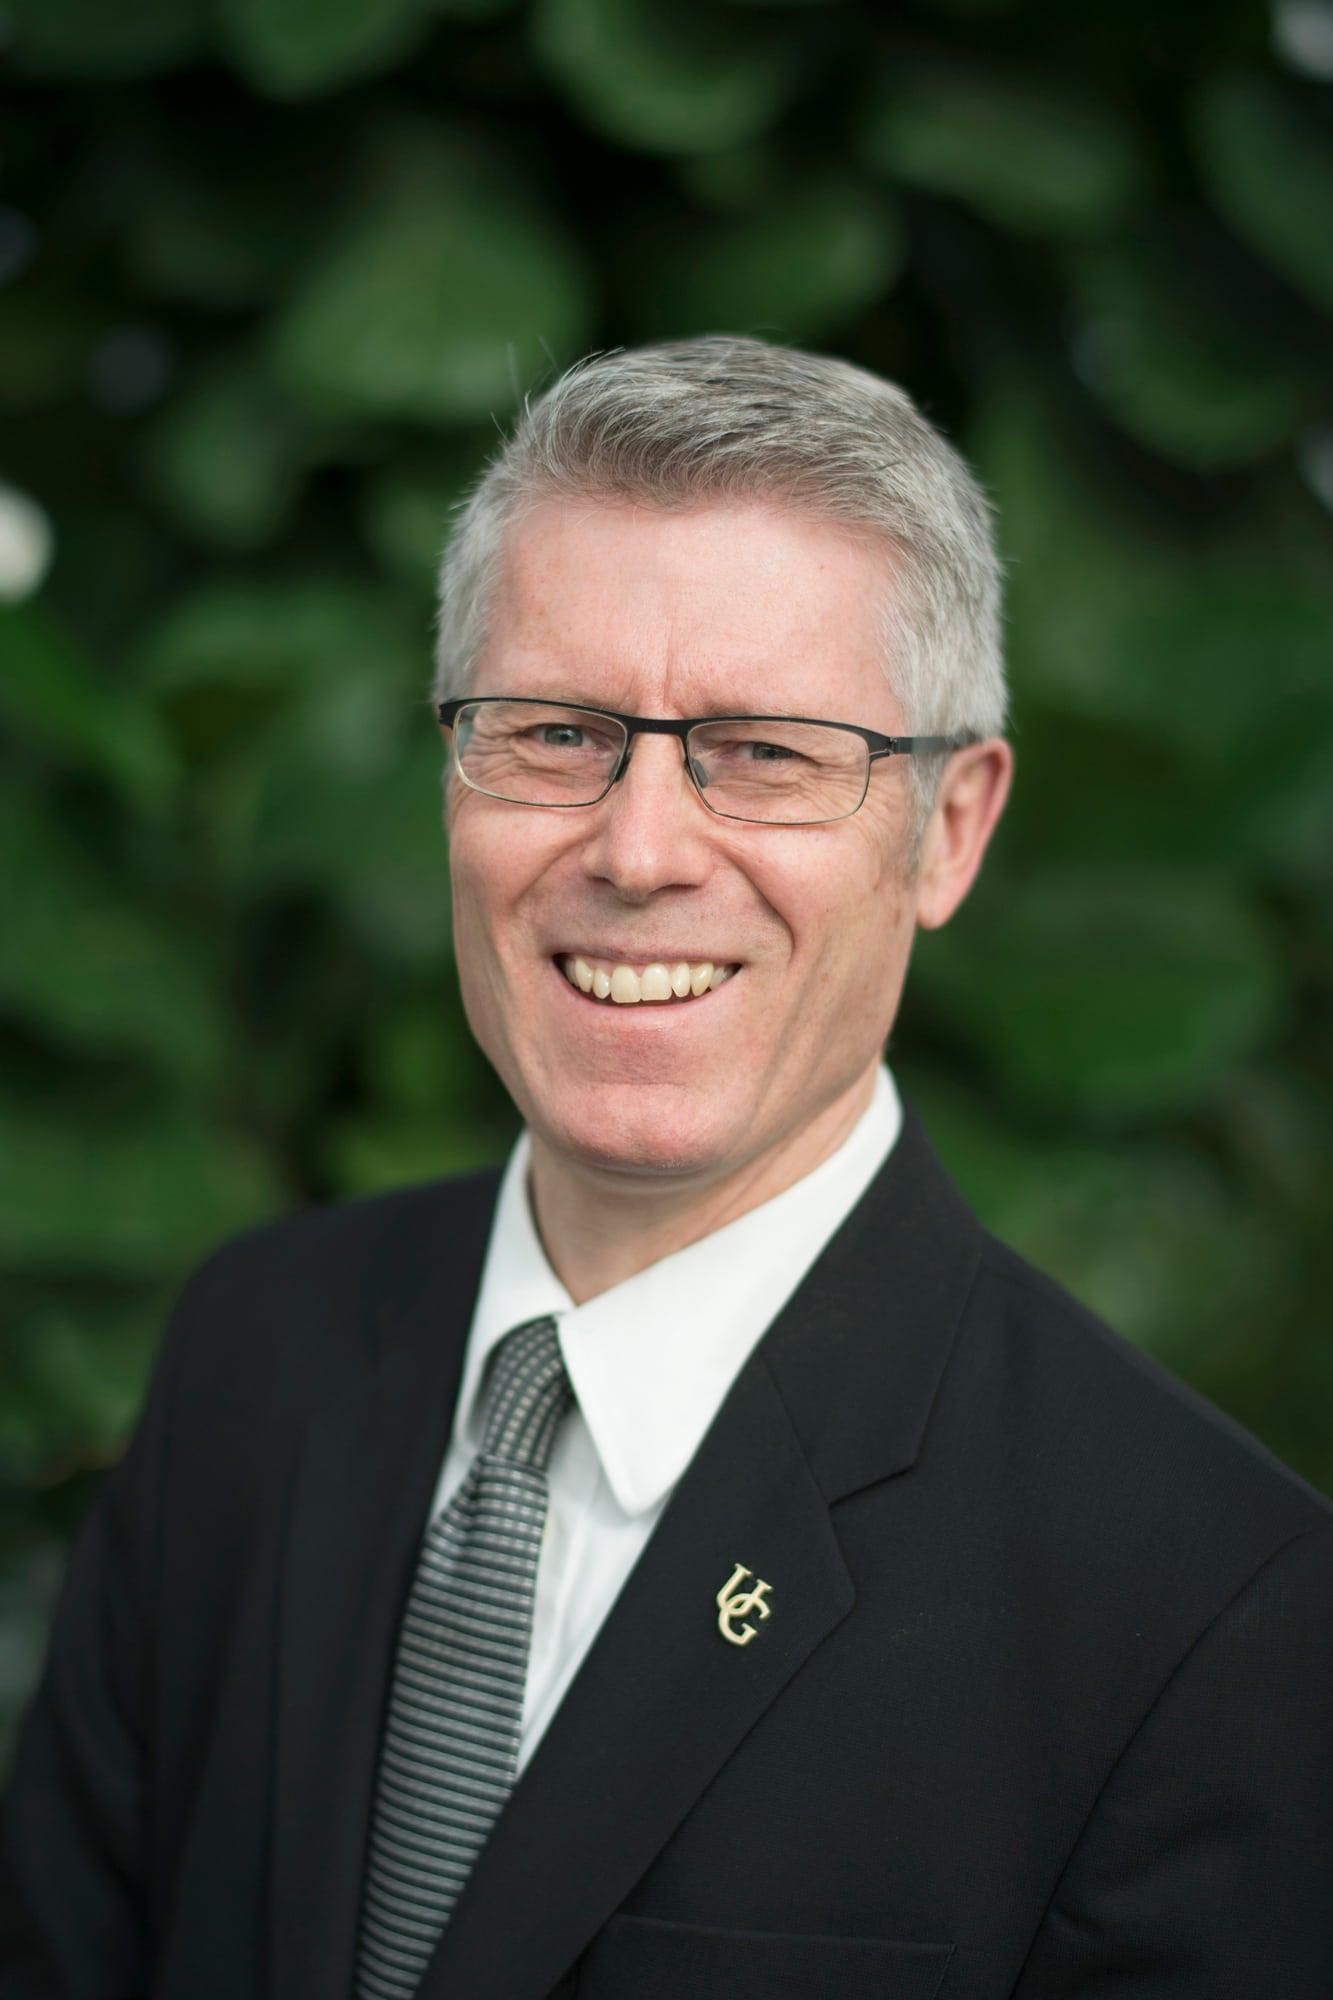 Malcolm Campbell smiling at camera